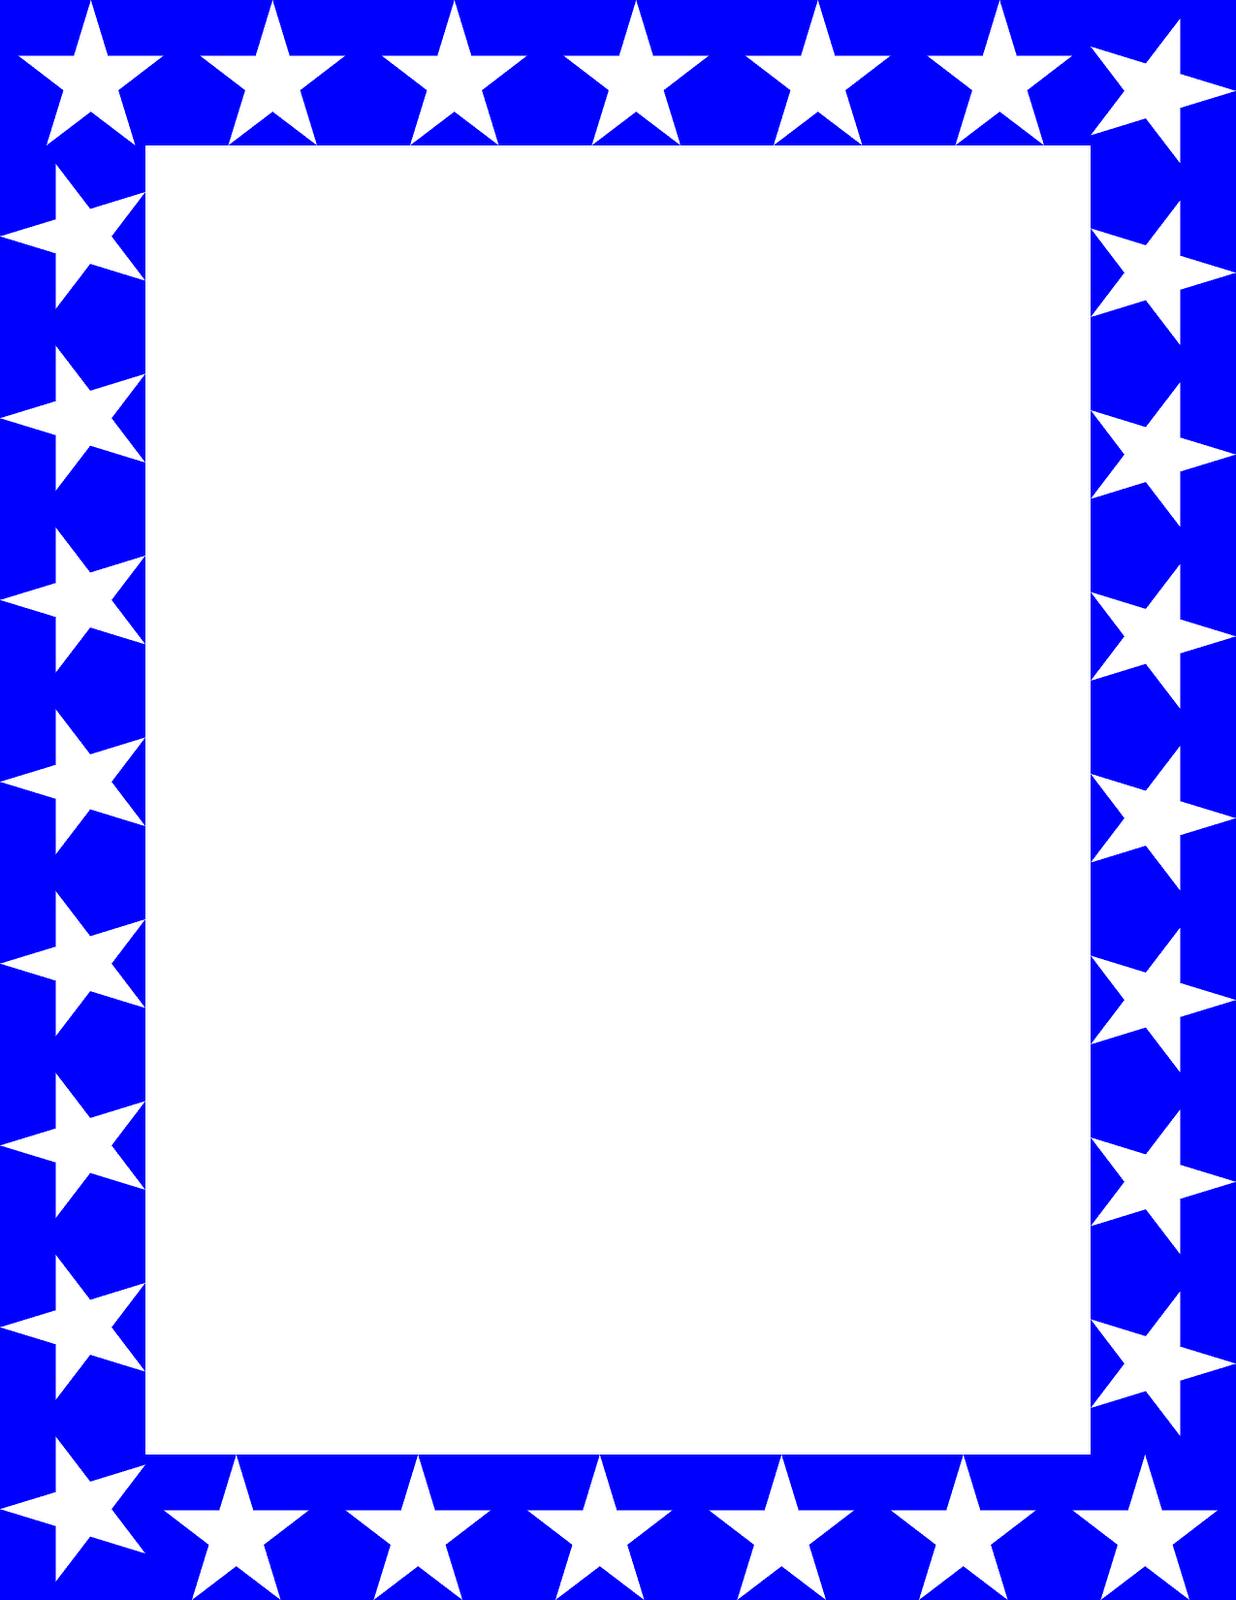 Best Star Border Clipart #27844.